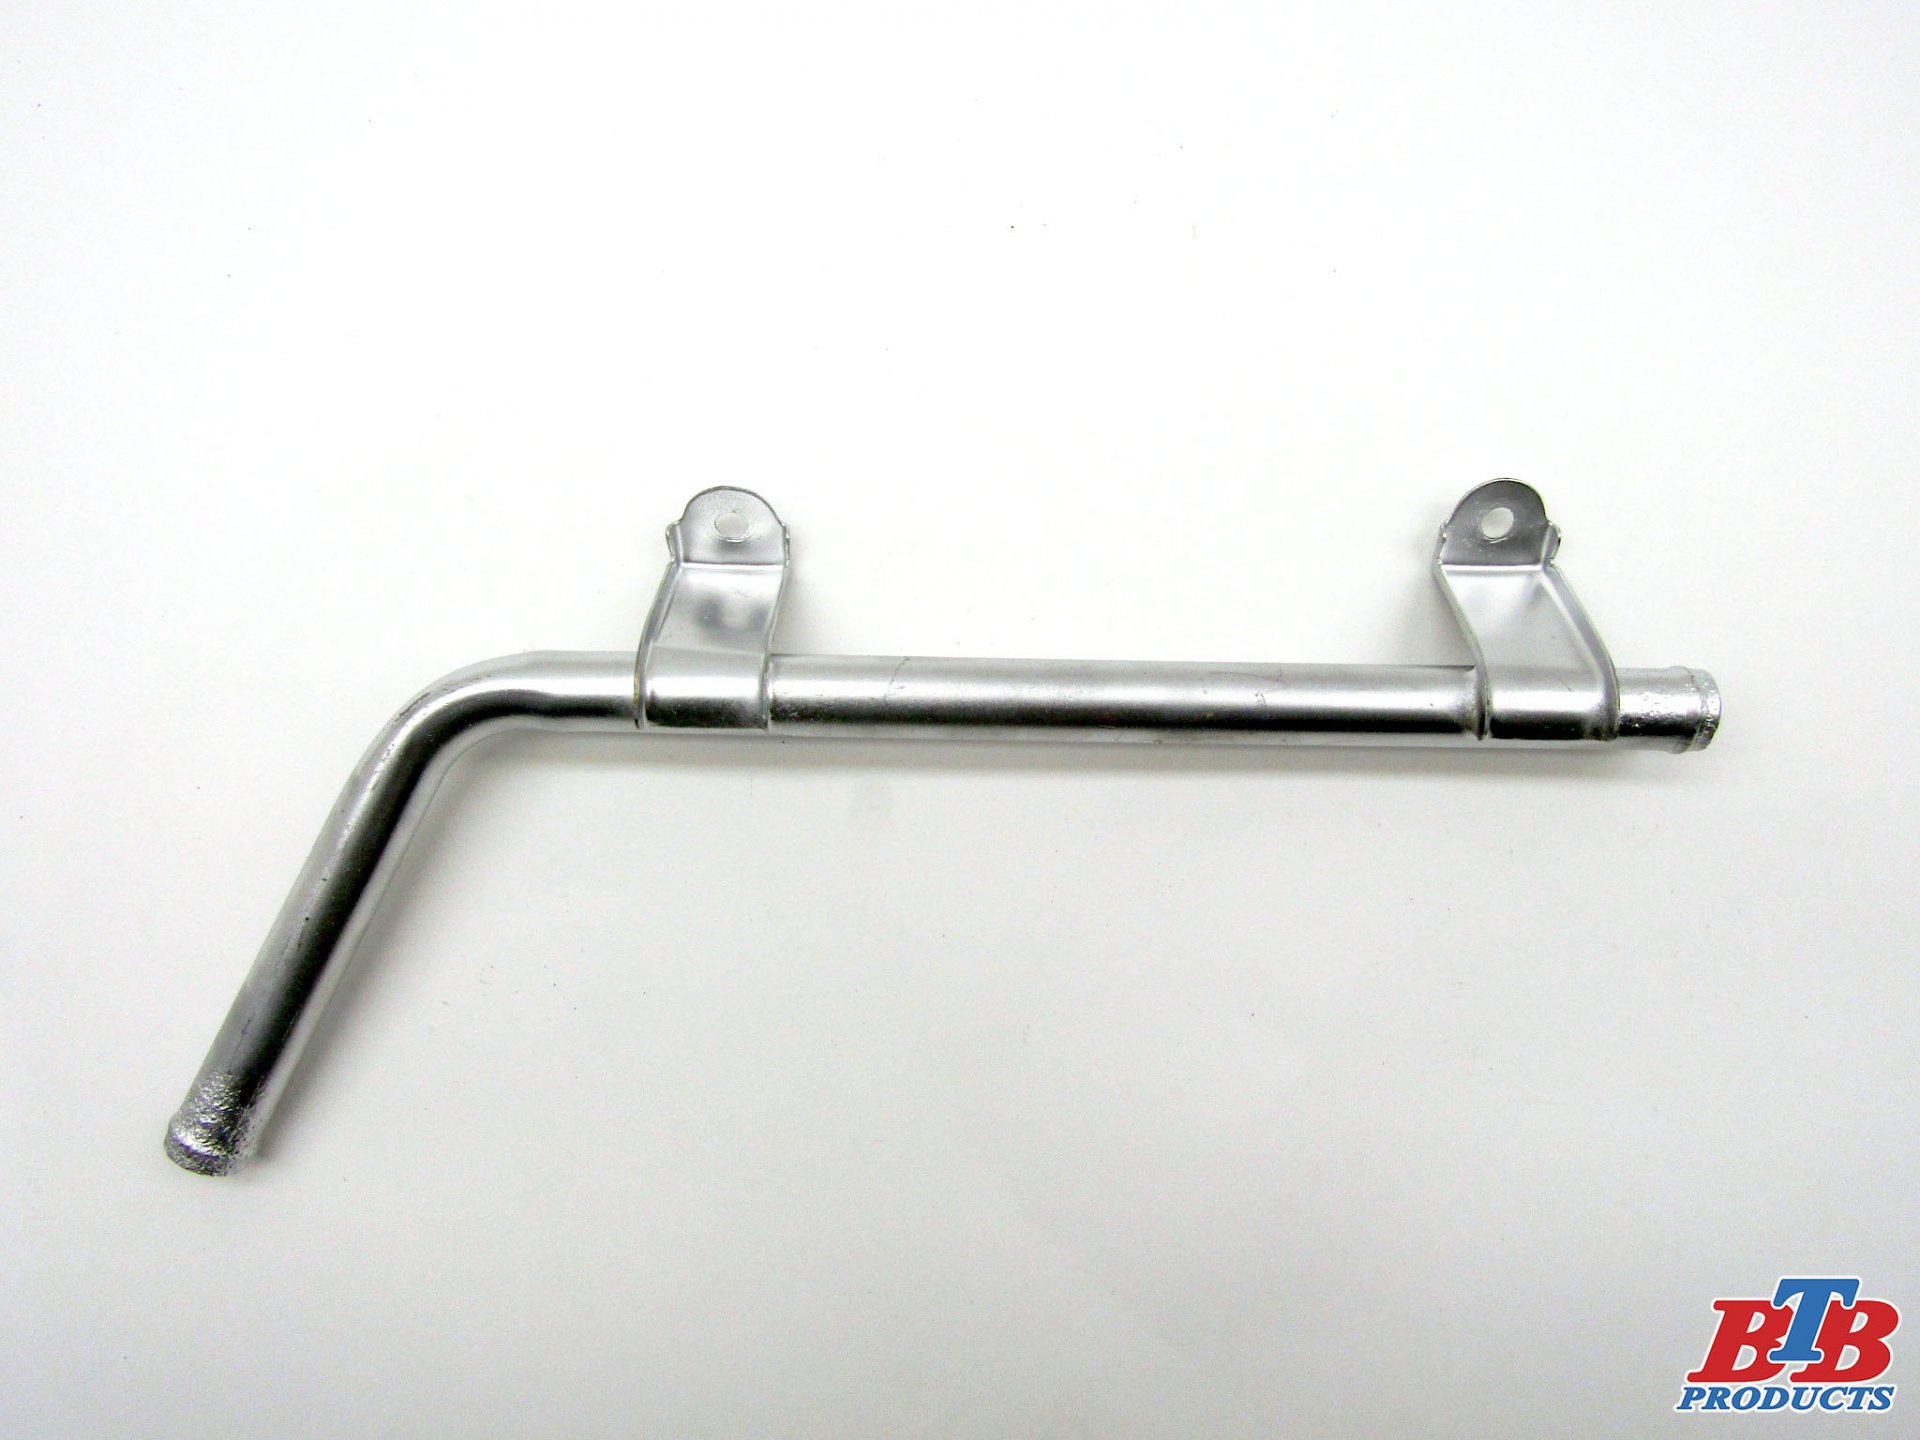 side-engine-heater-tube-Toyota-fj40-btb-87248-60181-R-b.jpeg